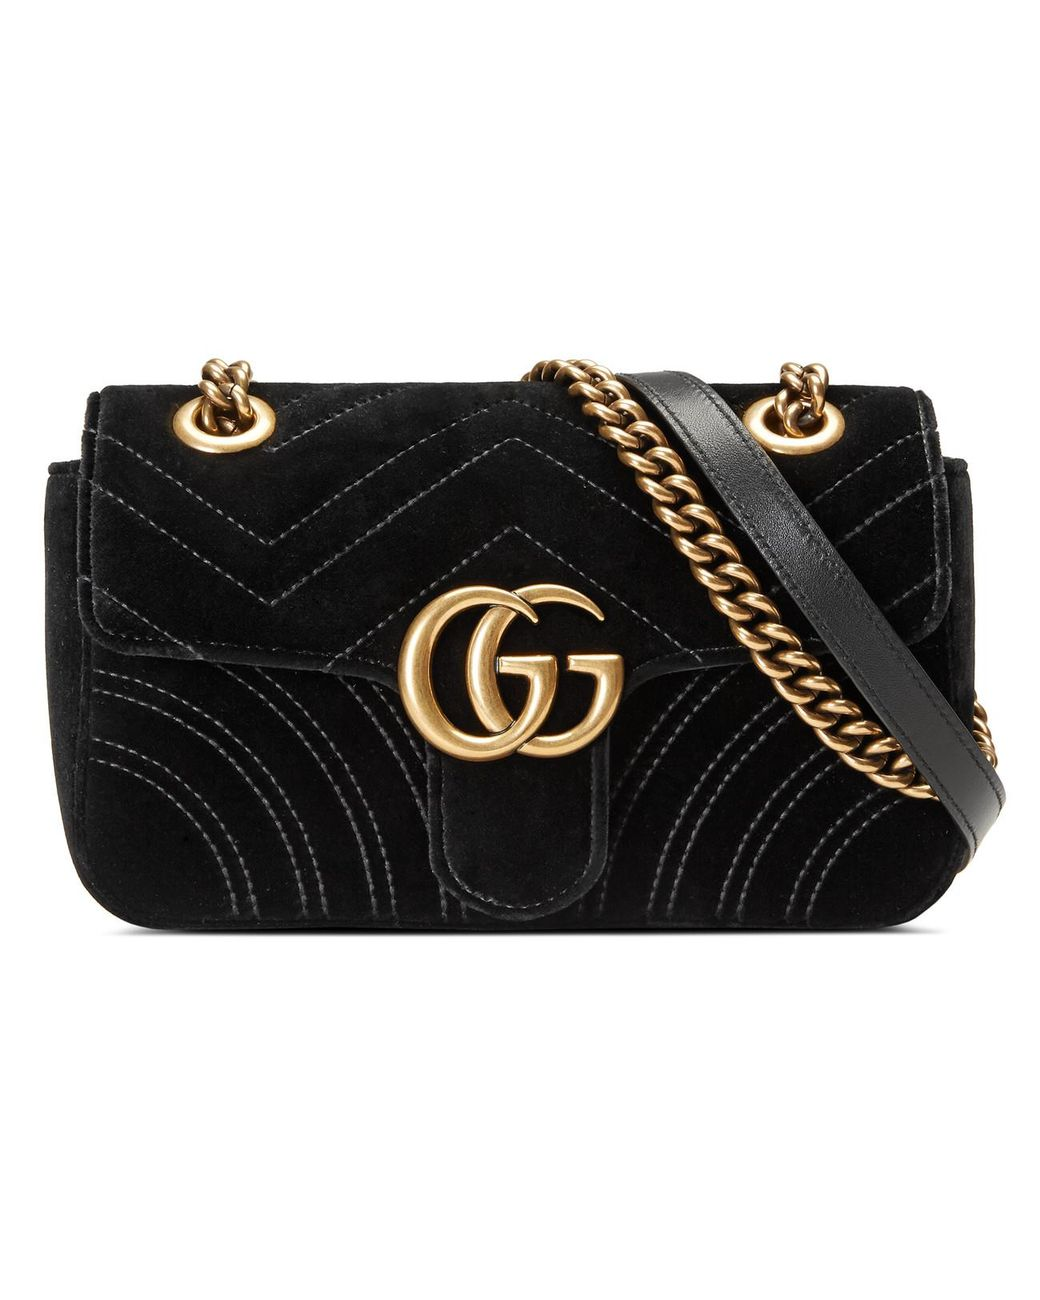 9ba5ac0ba7b55d Gucci GG Marmont Velvet Mini Shoulder Bag in Black - Lyst